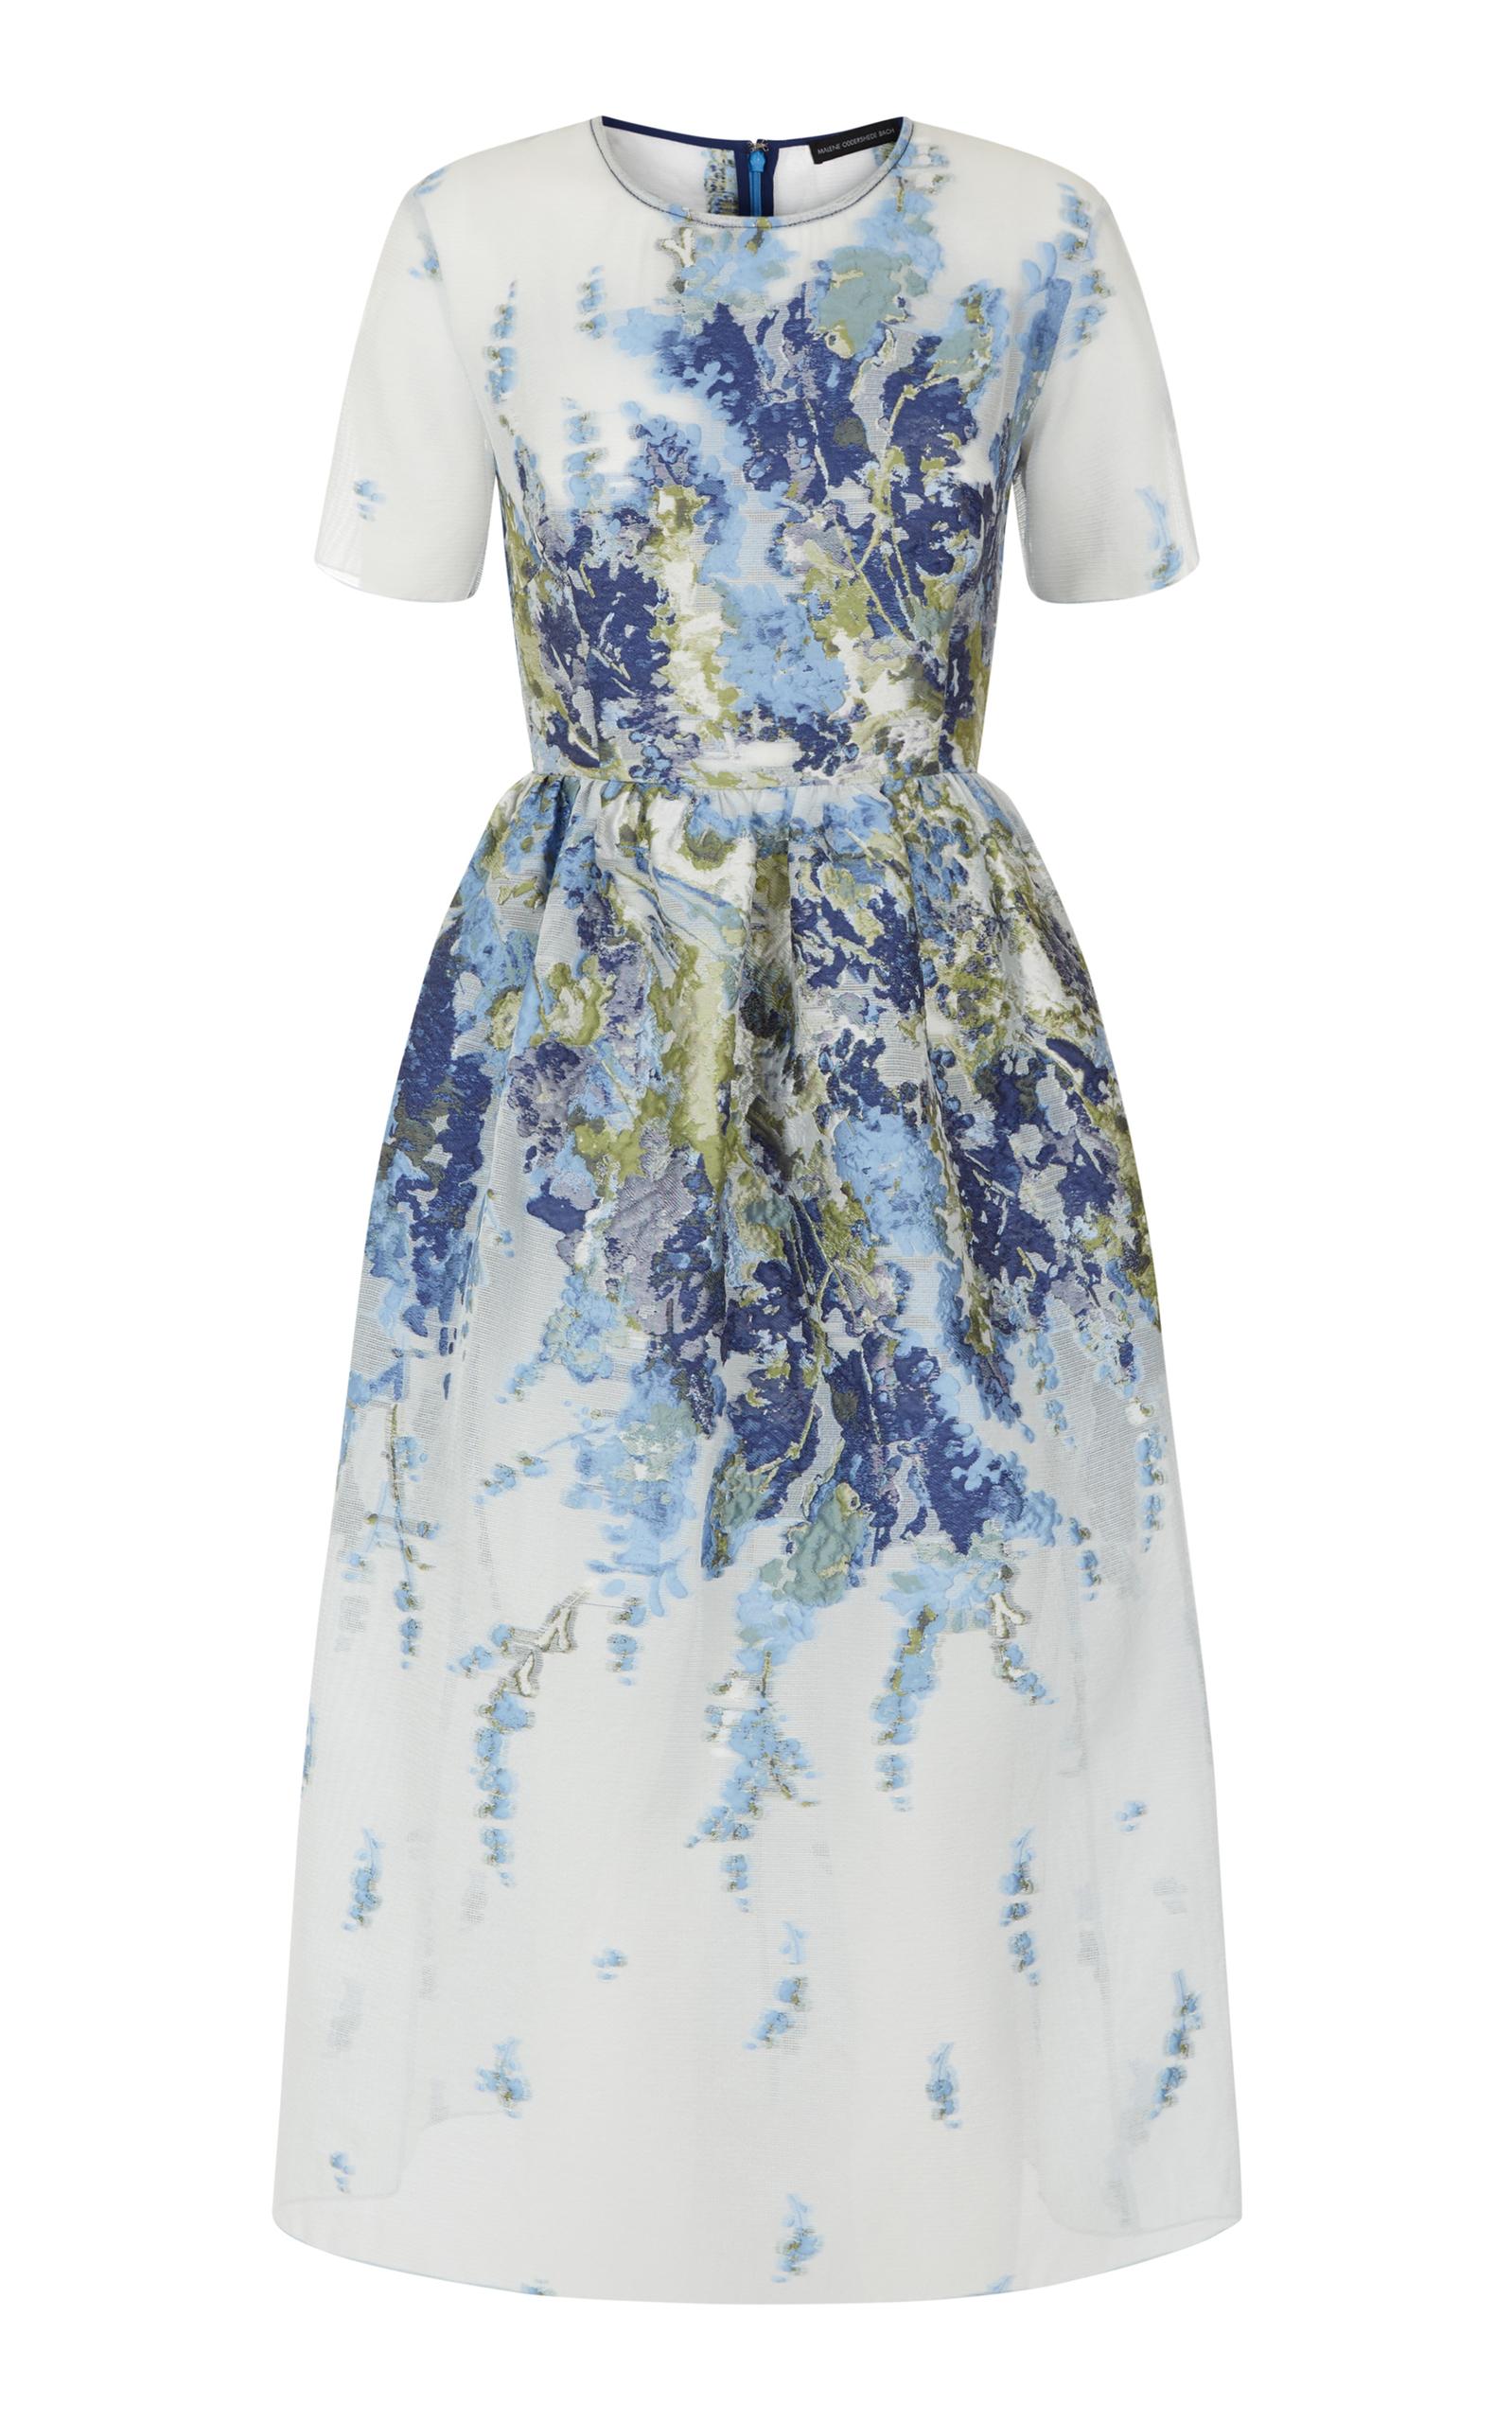 96294f5aa029 Haze Floral Midi Dress by Malene Oddershede Bach   Moda Operandi